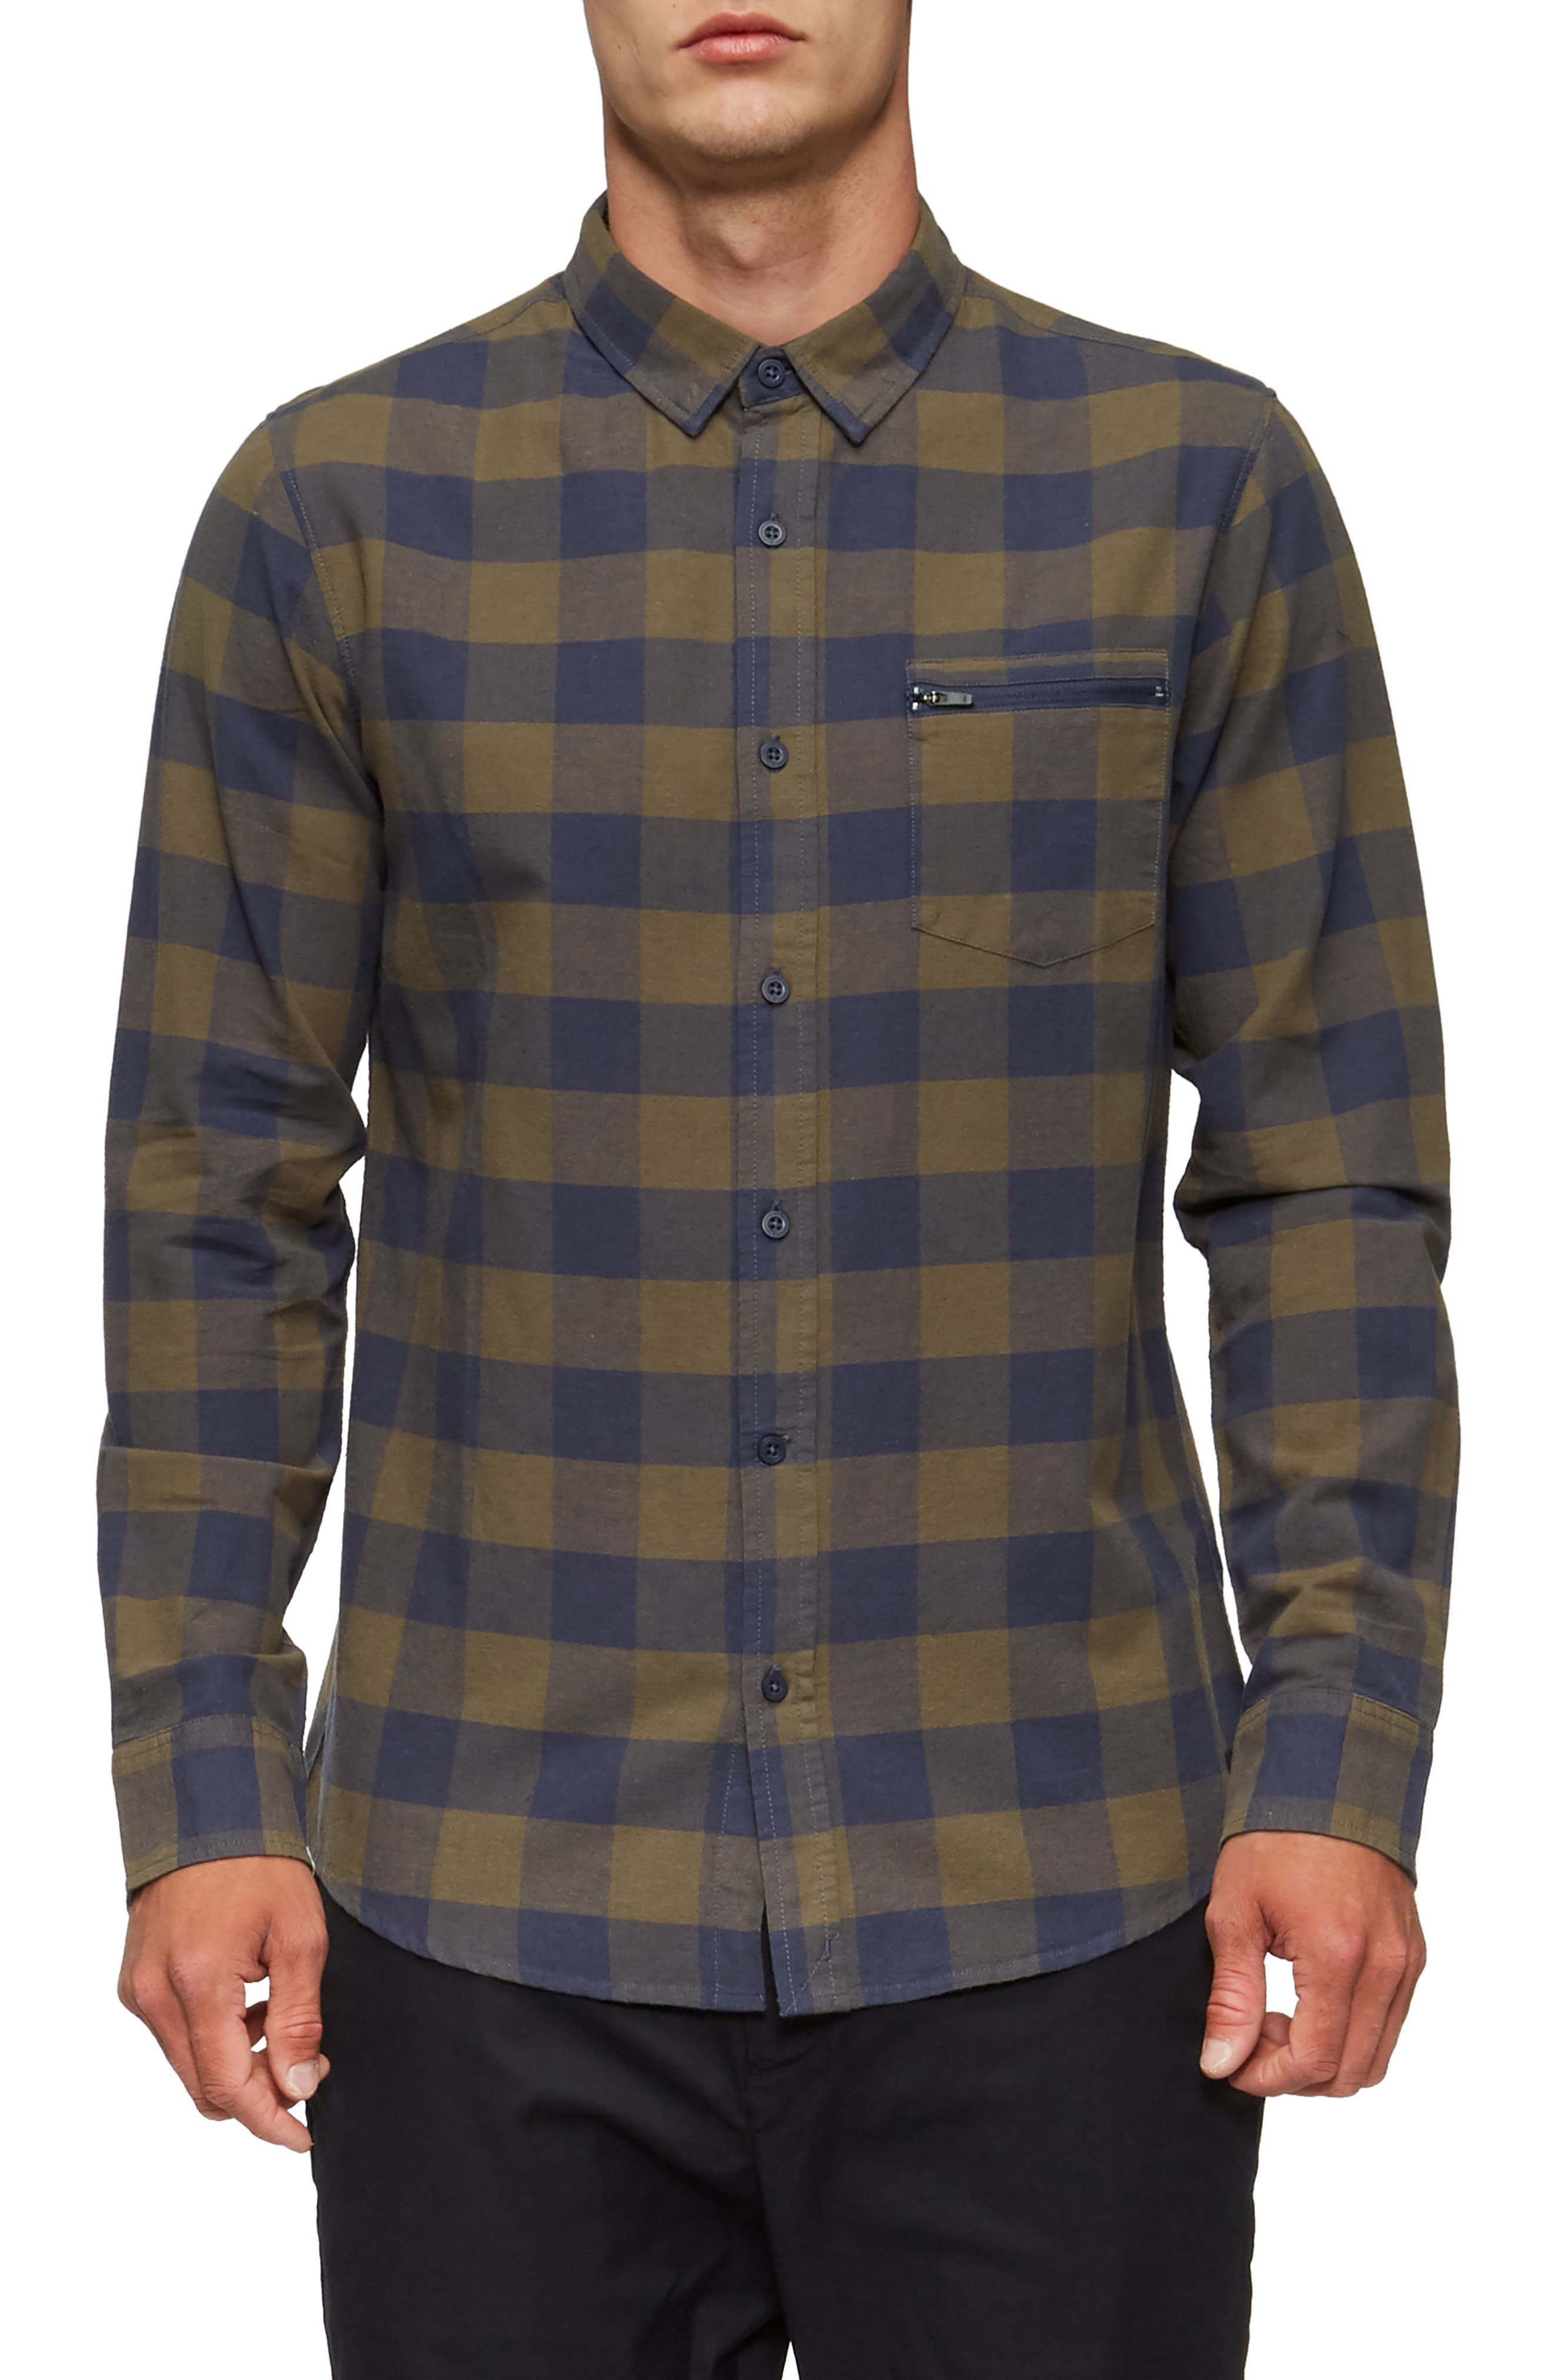 Cohen Long-Sleeve Shirt,                         Main,                         color, Shadow Blue/ Olive